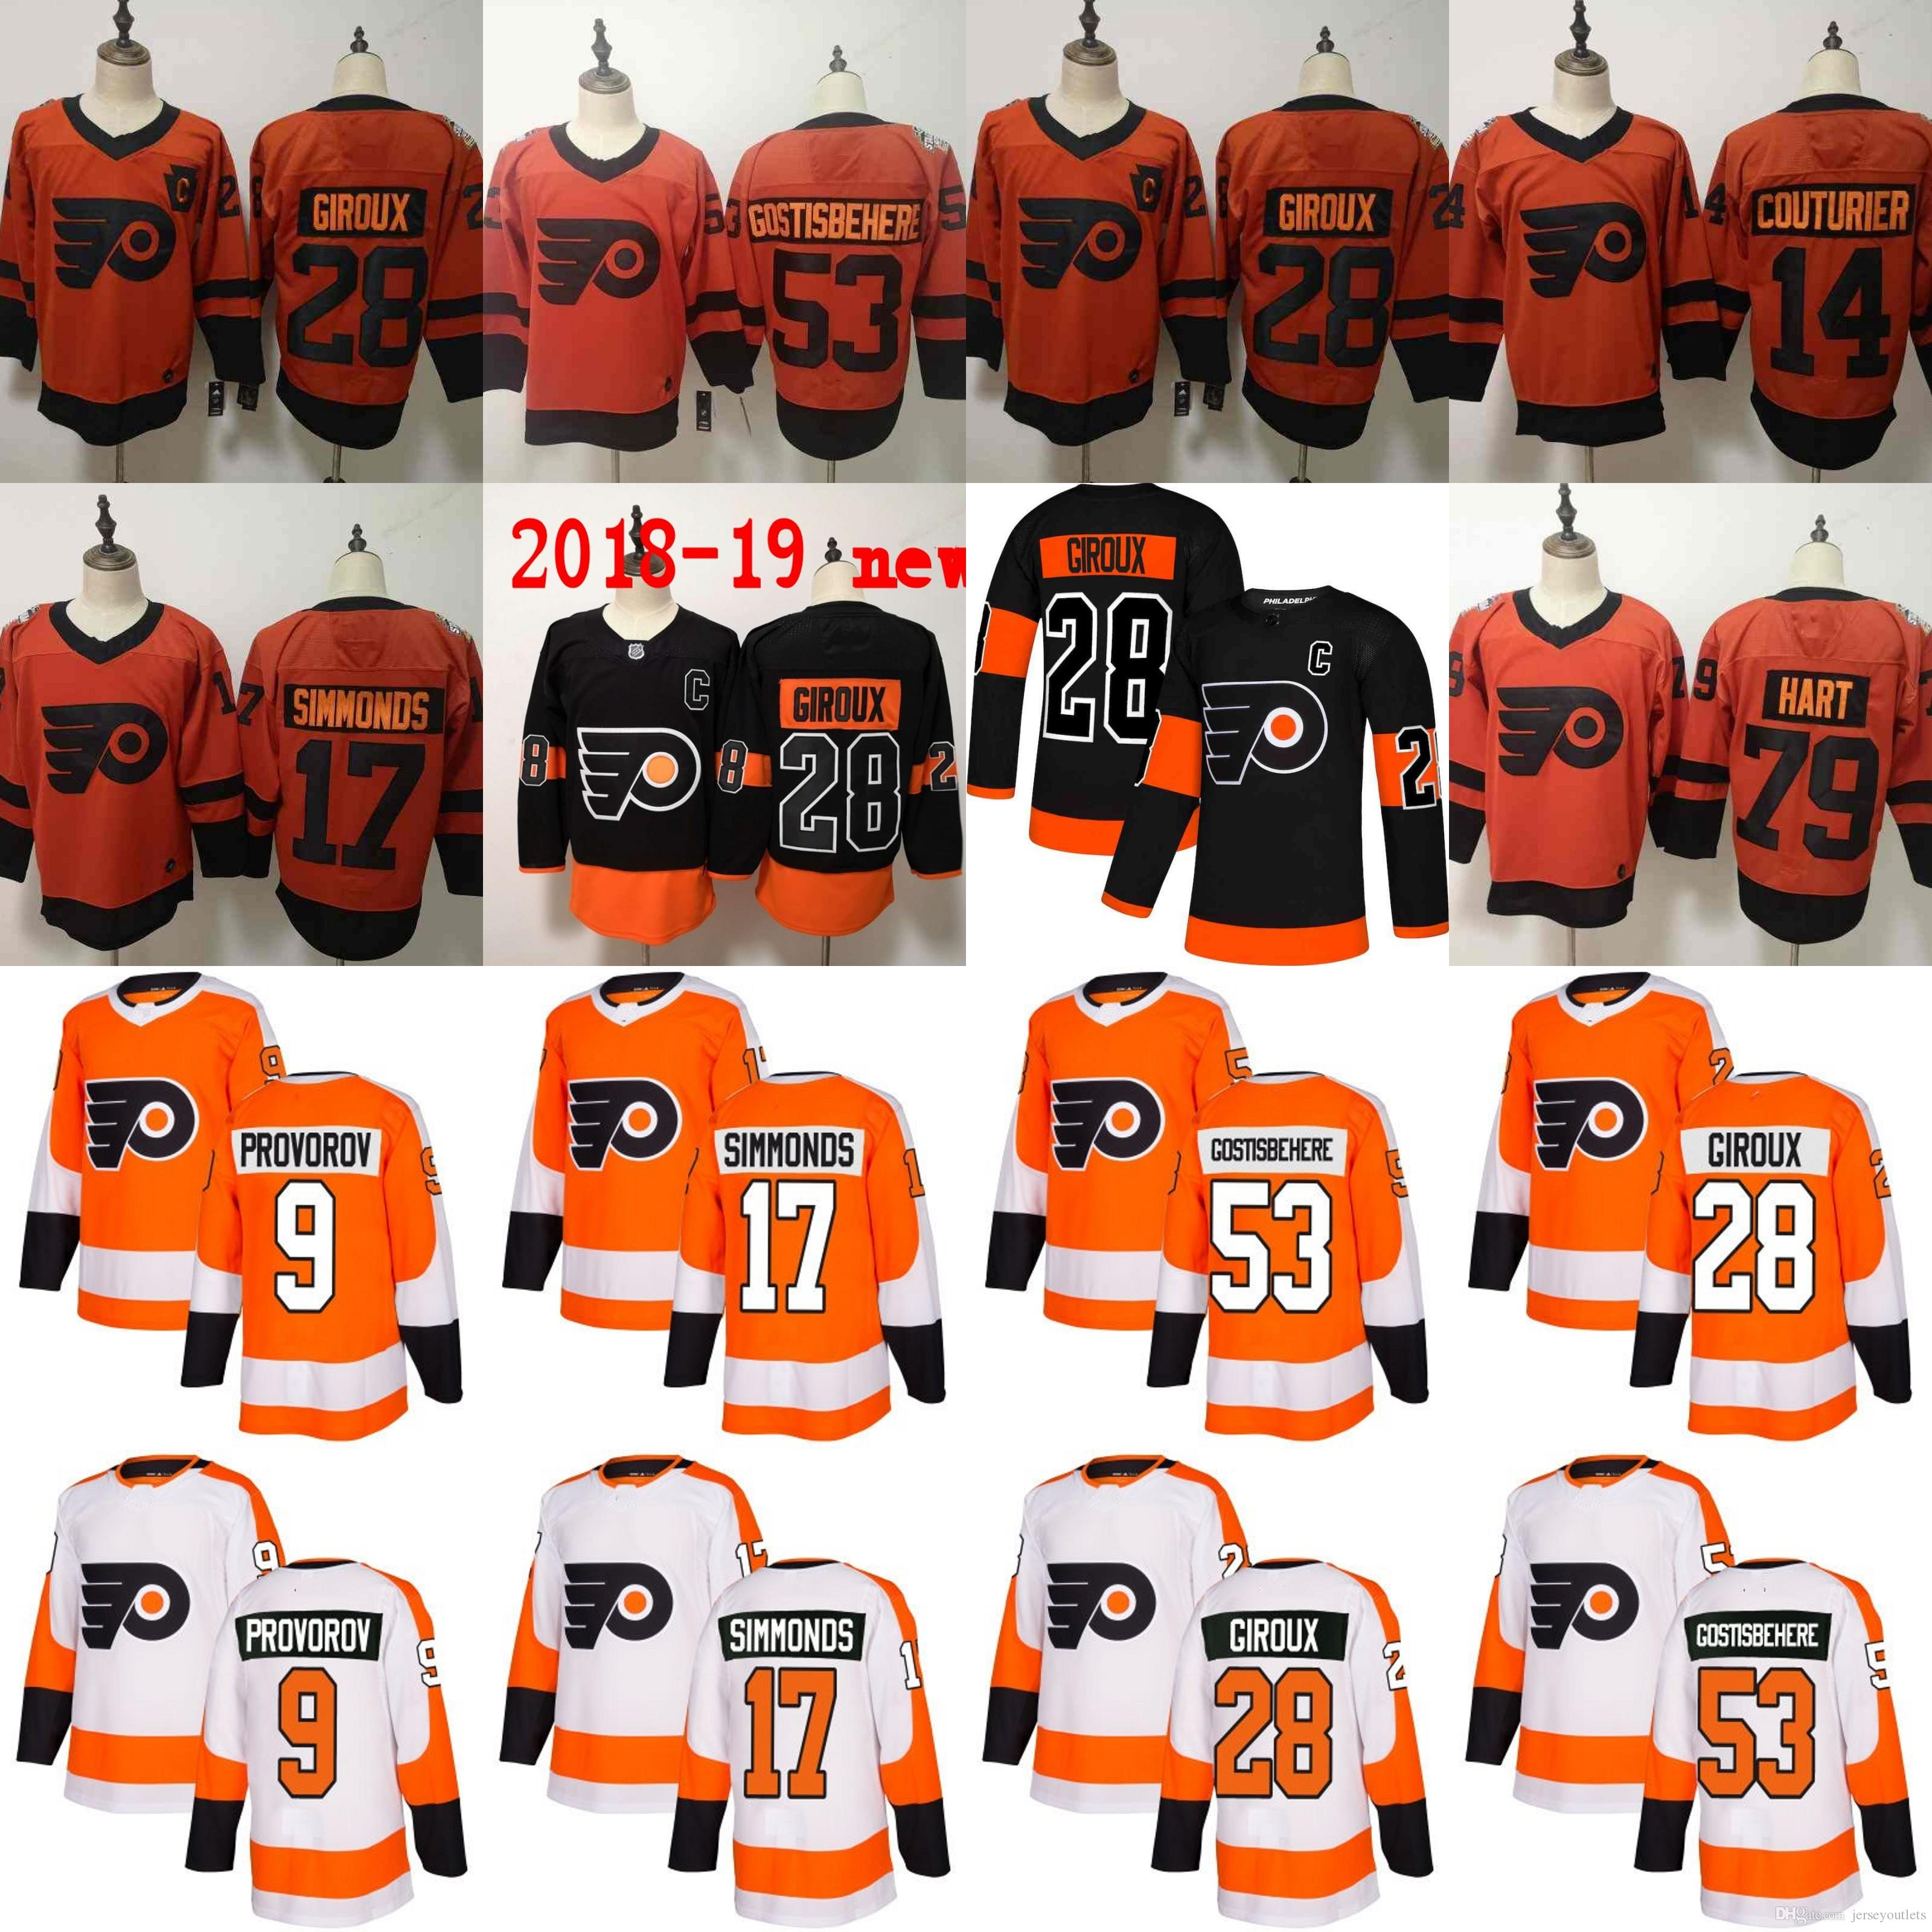 11f836d5f28 ... philadelphia flyers gostisbehere jersey 2019 2018 Men Philadelphia  Flyers 53 Shayne ...